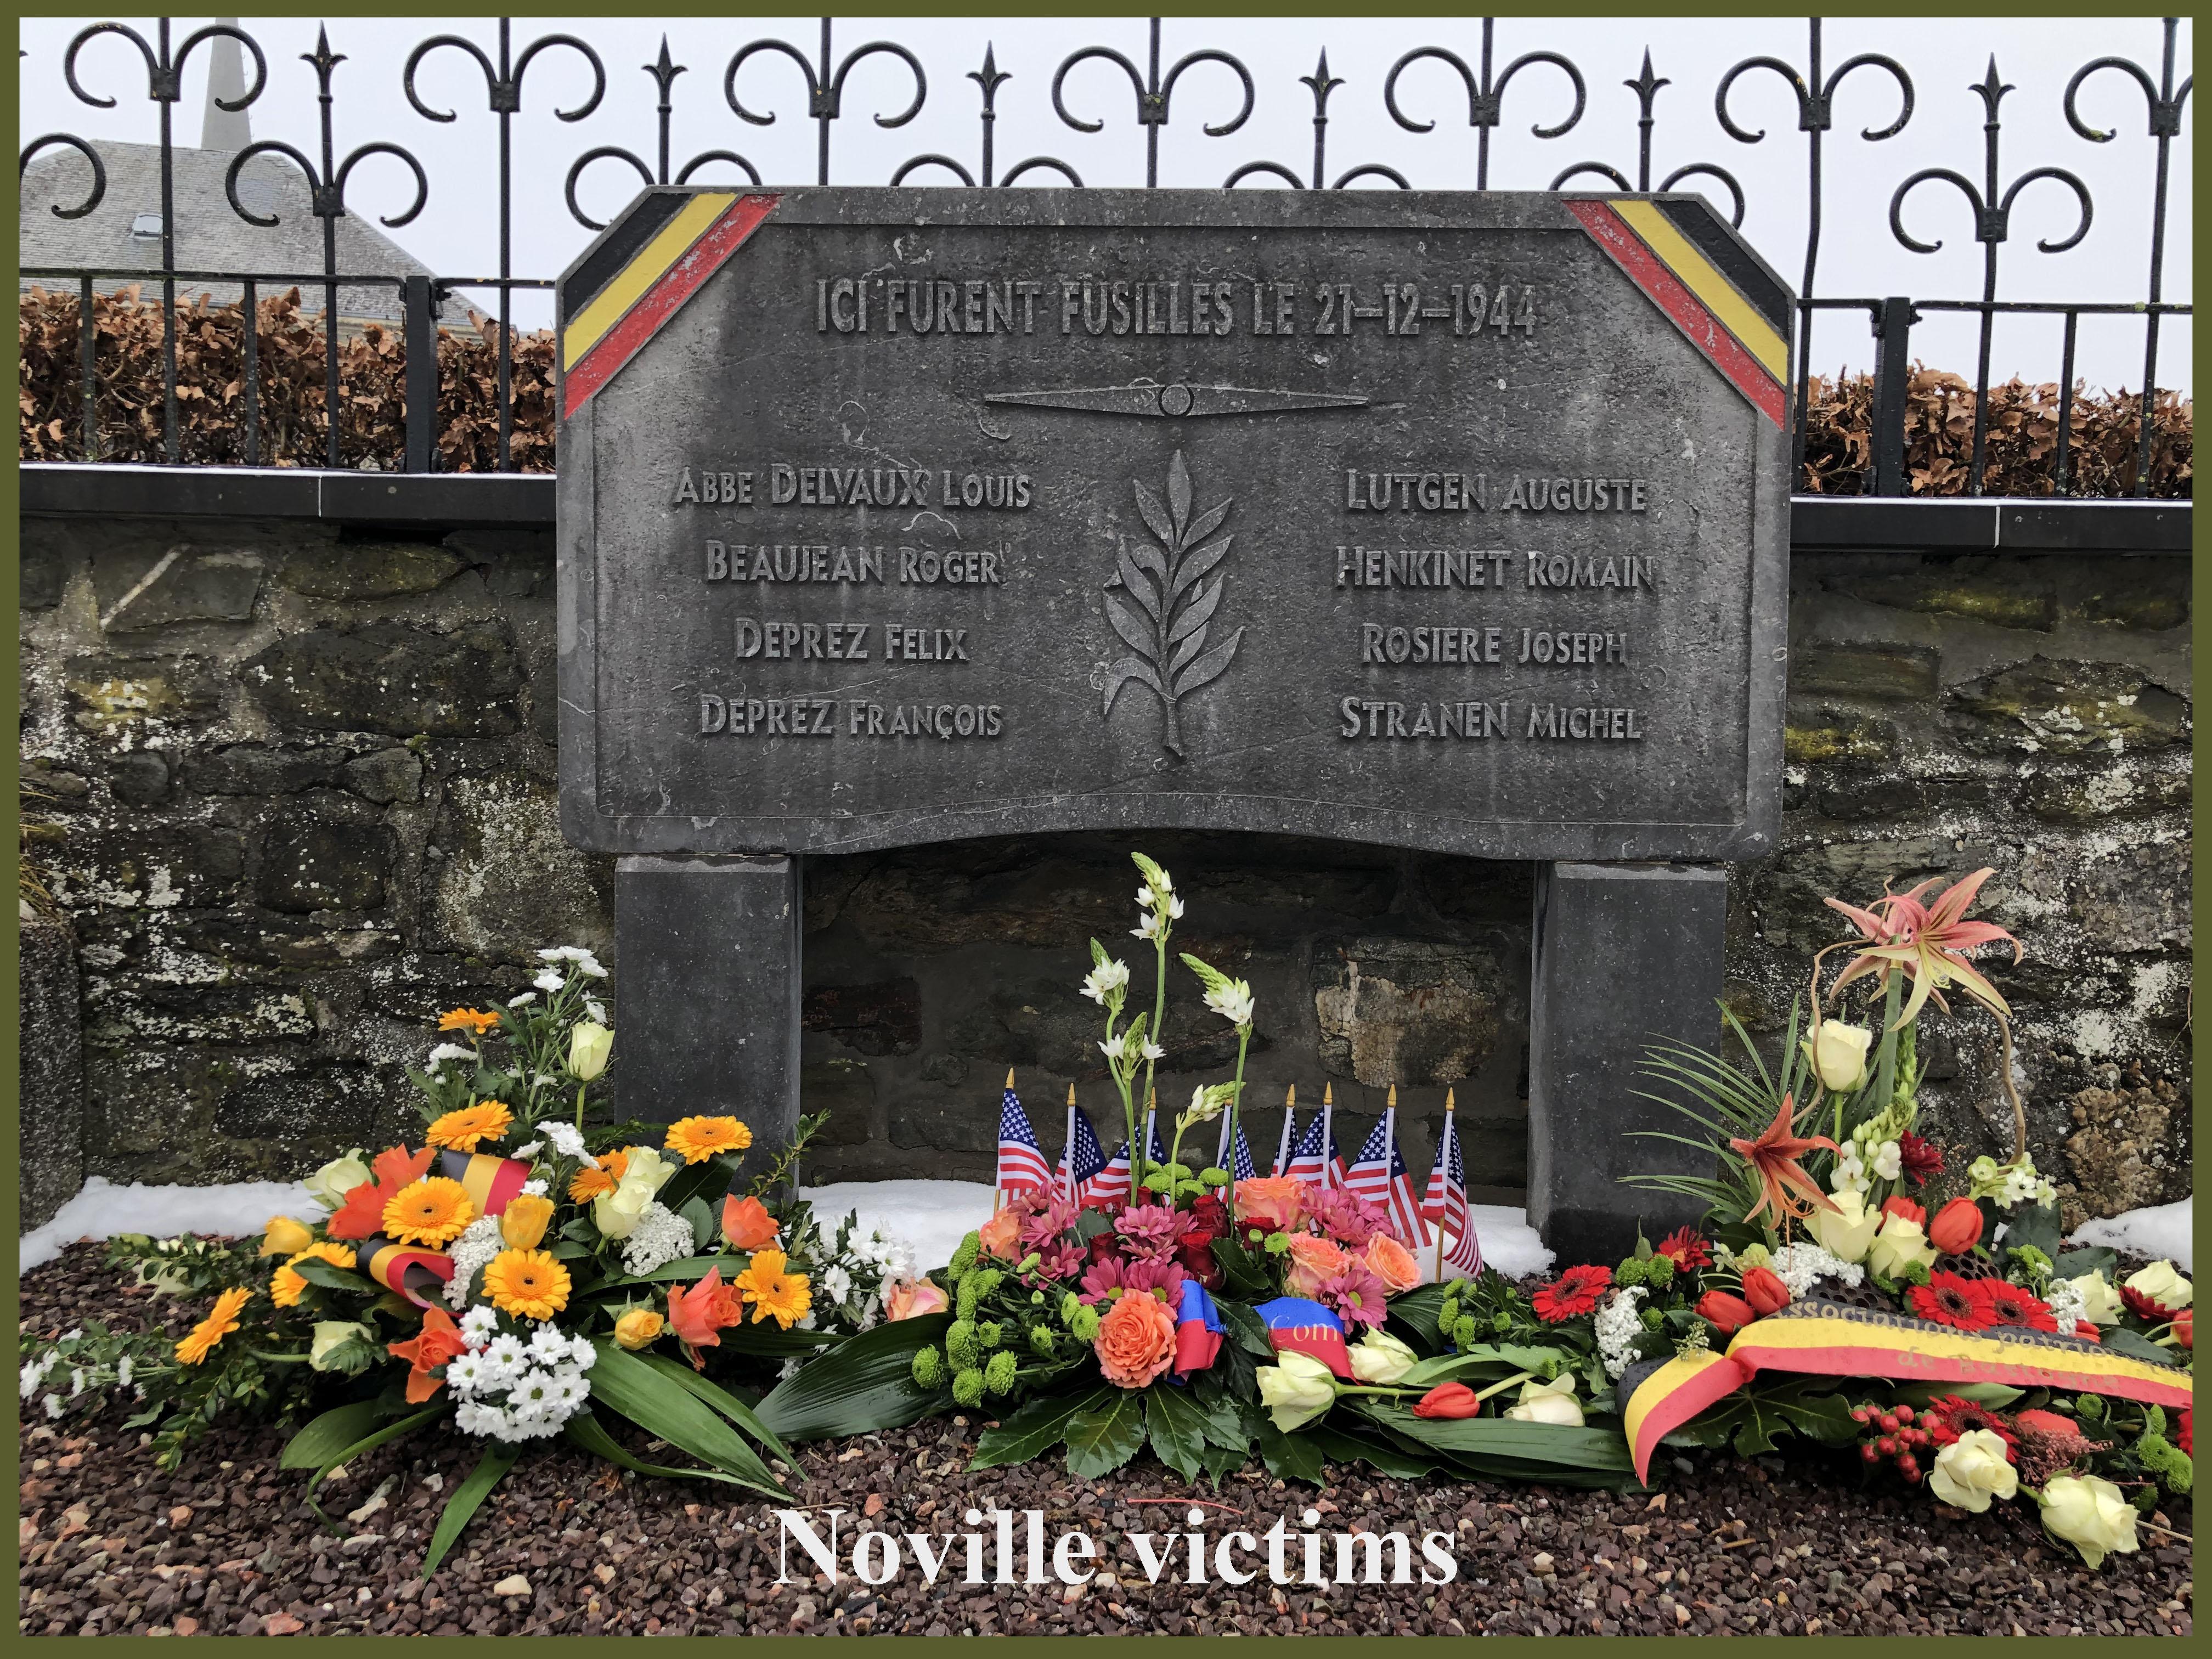 Noville december 21 civilians executed